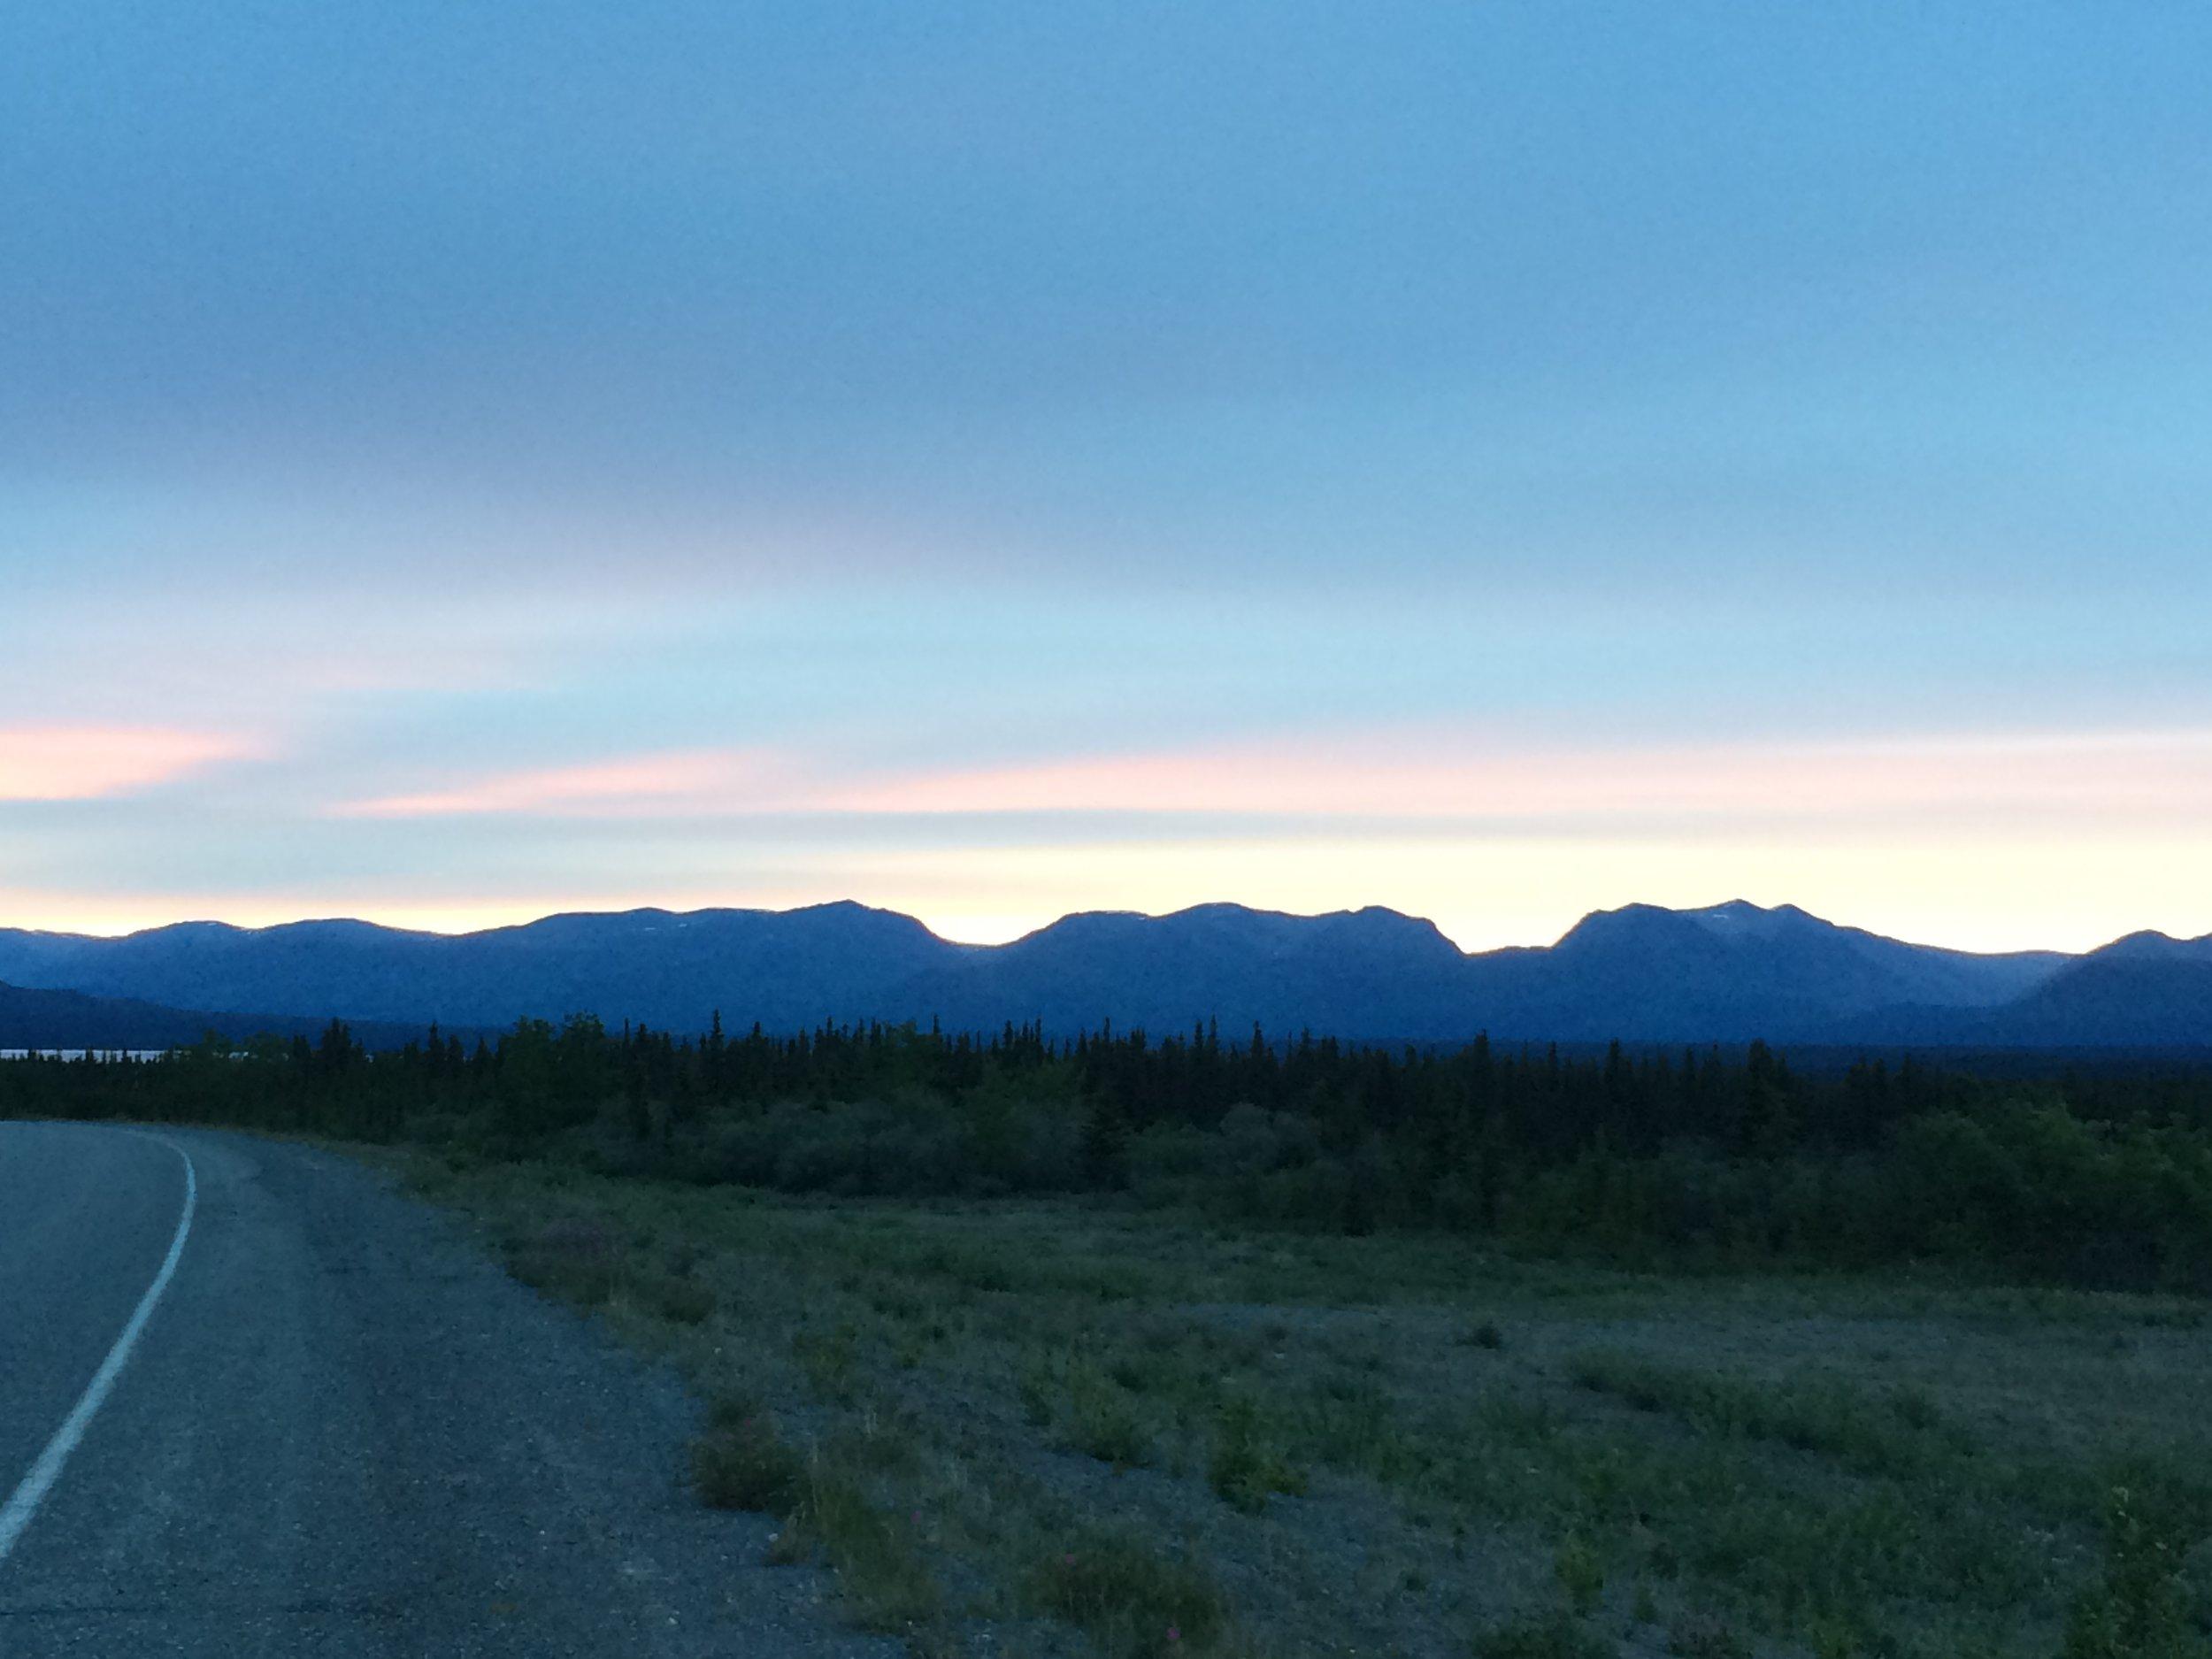 Picture taken at midnight (12 am) in Kluane. Land of the midnight sun.